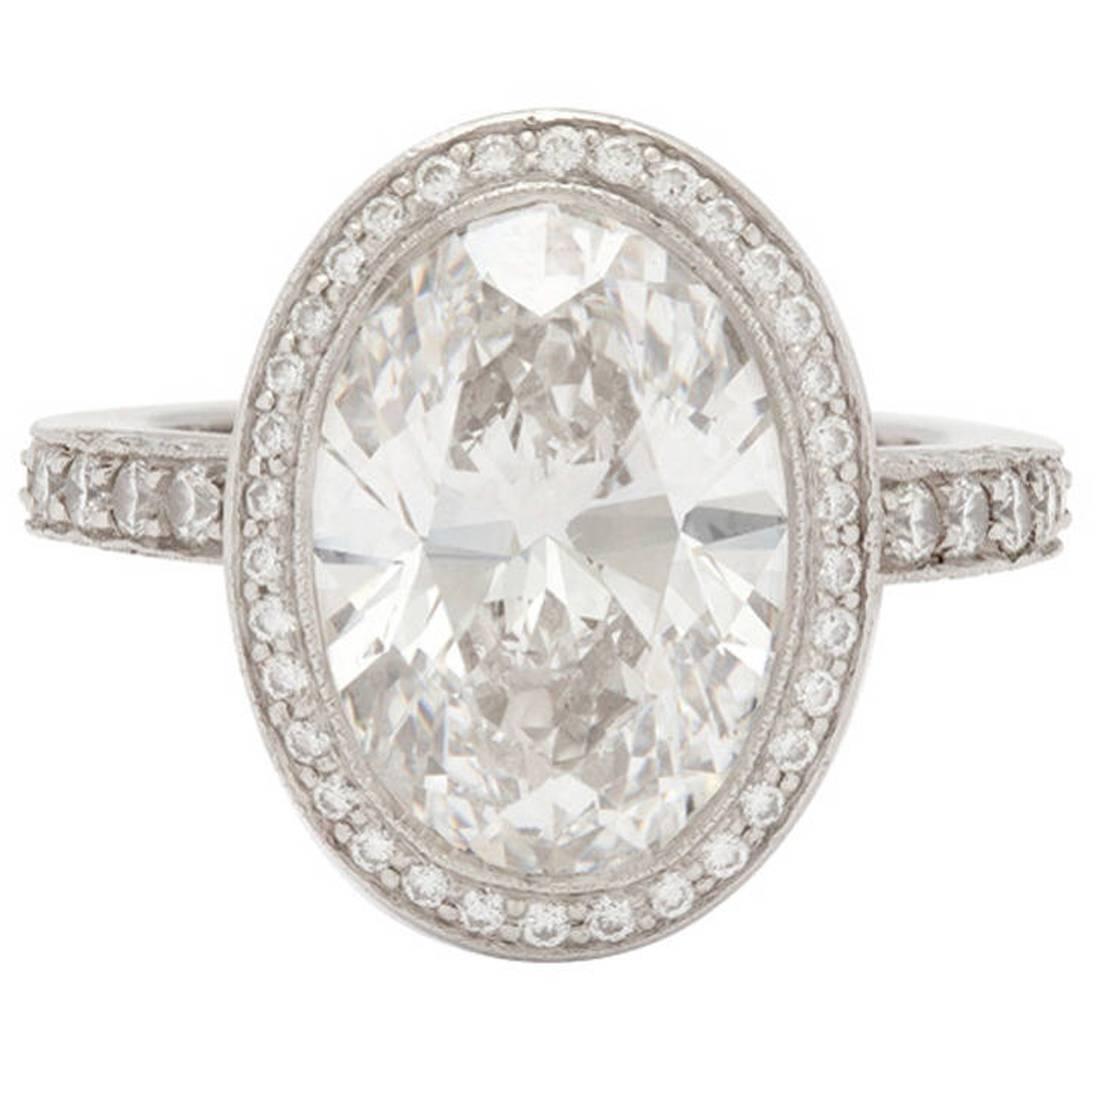 Tiffany And Co 478 Carat Custom Oval Diamond Platinum Ring At 1stdibs